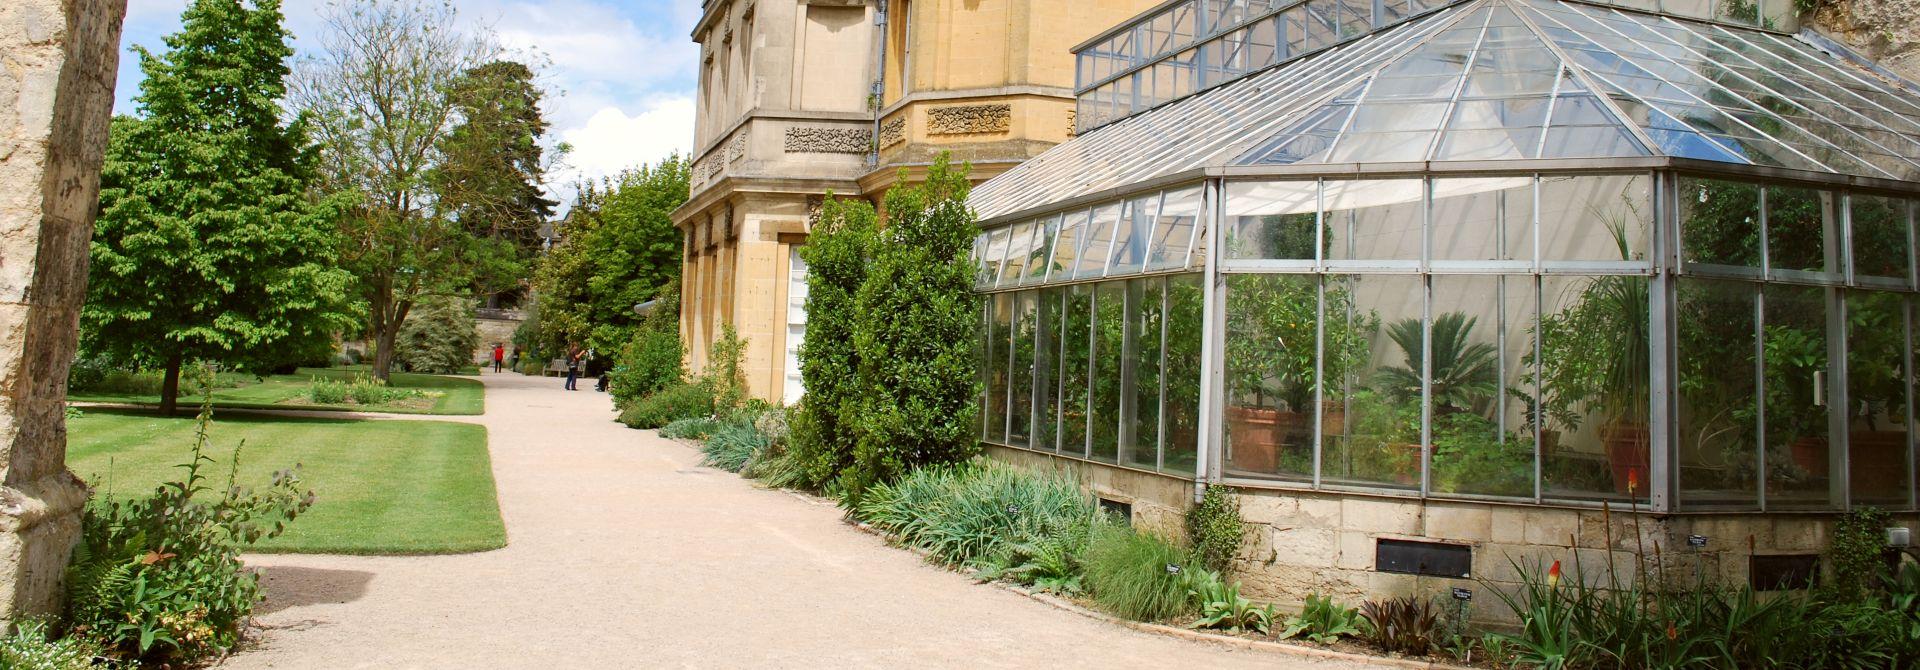 Oxford Botanic Garden Hero